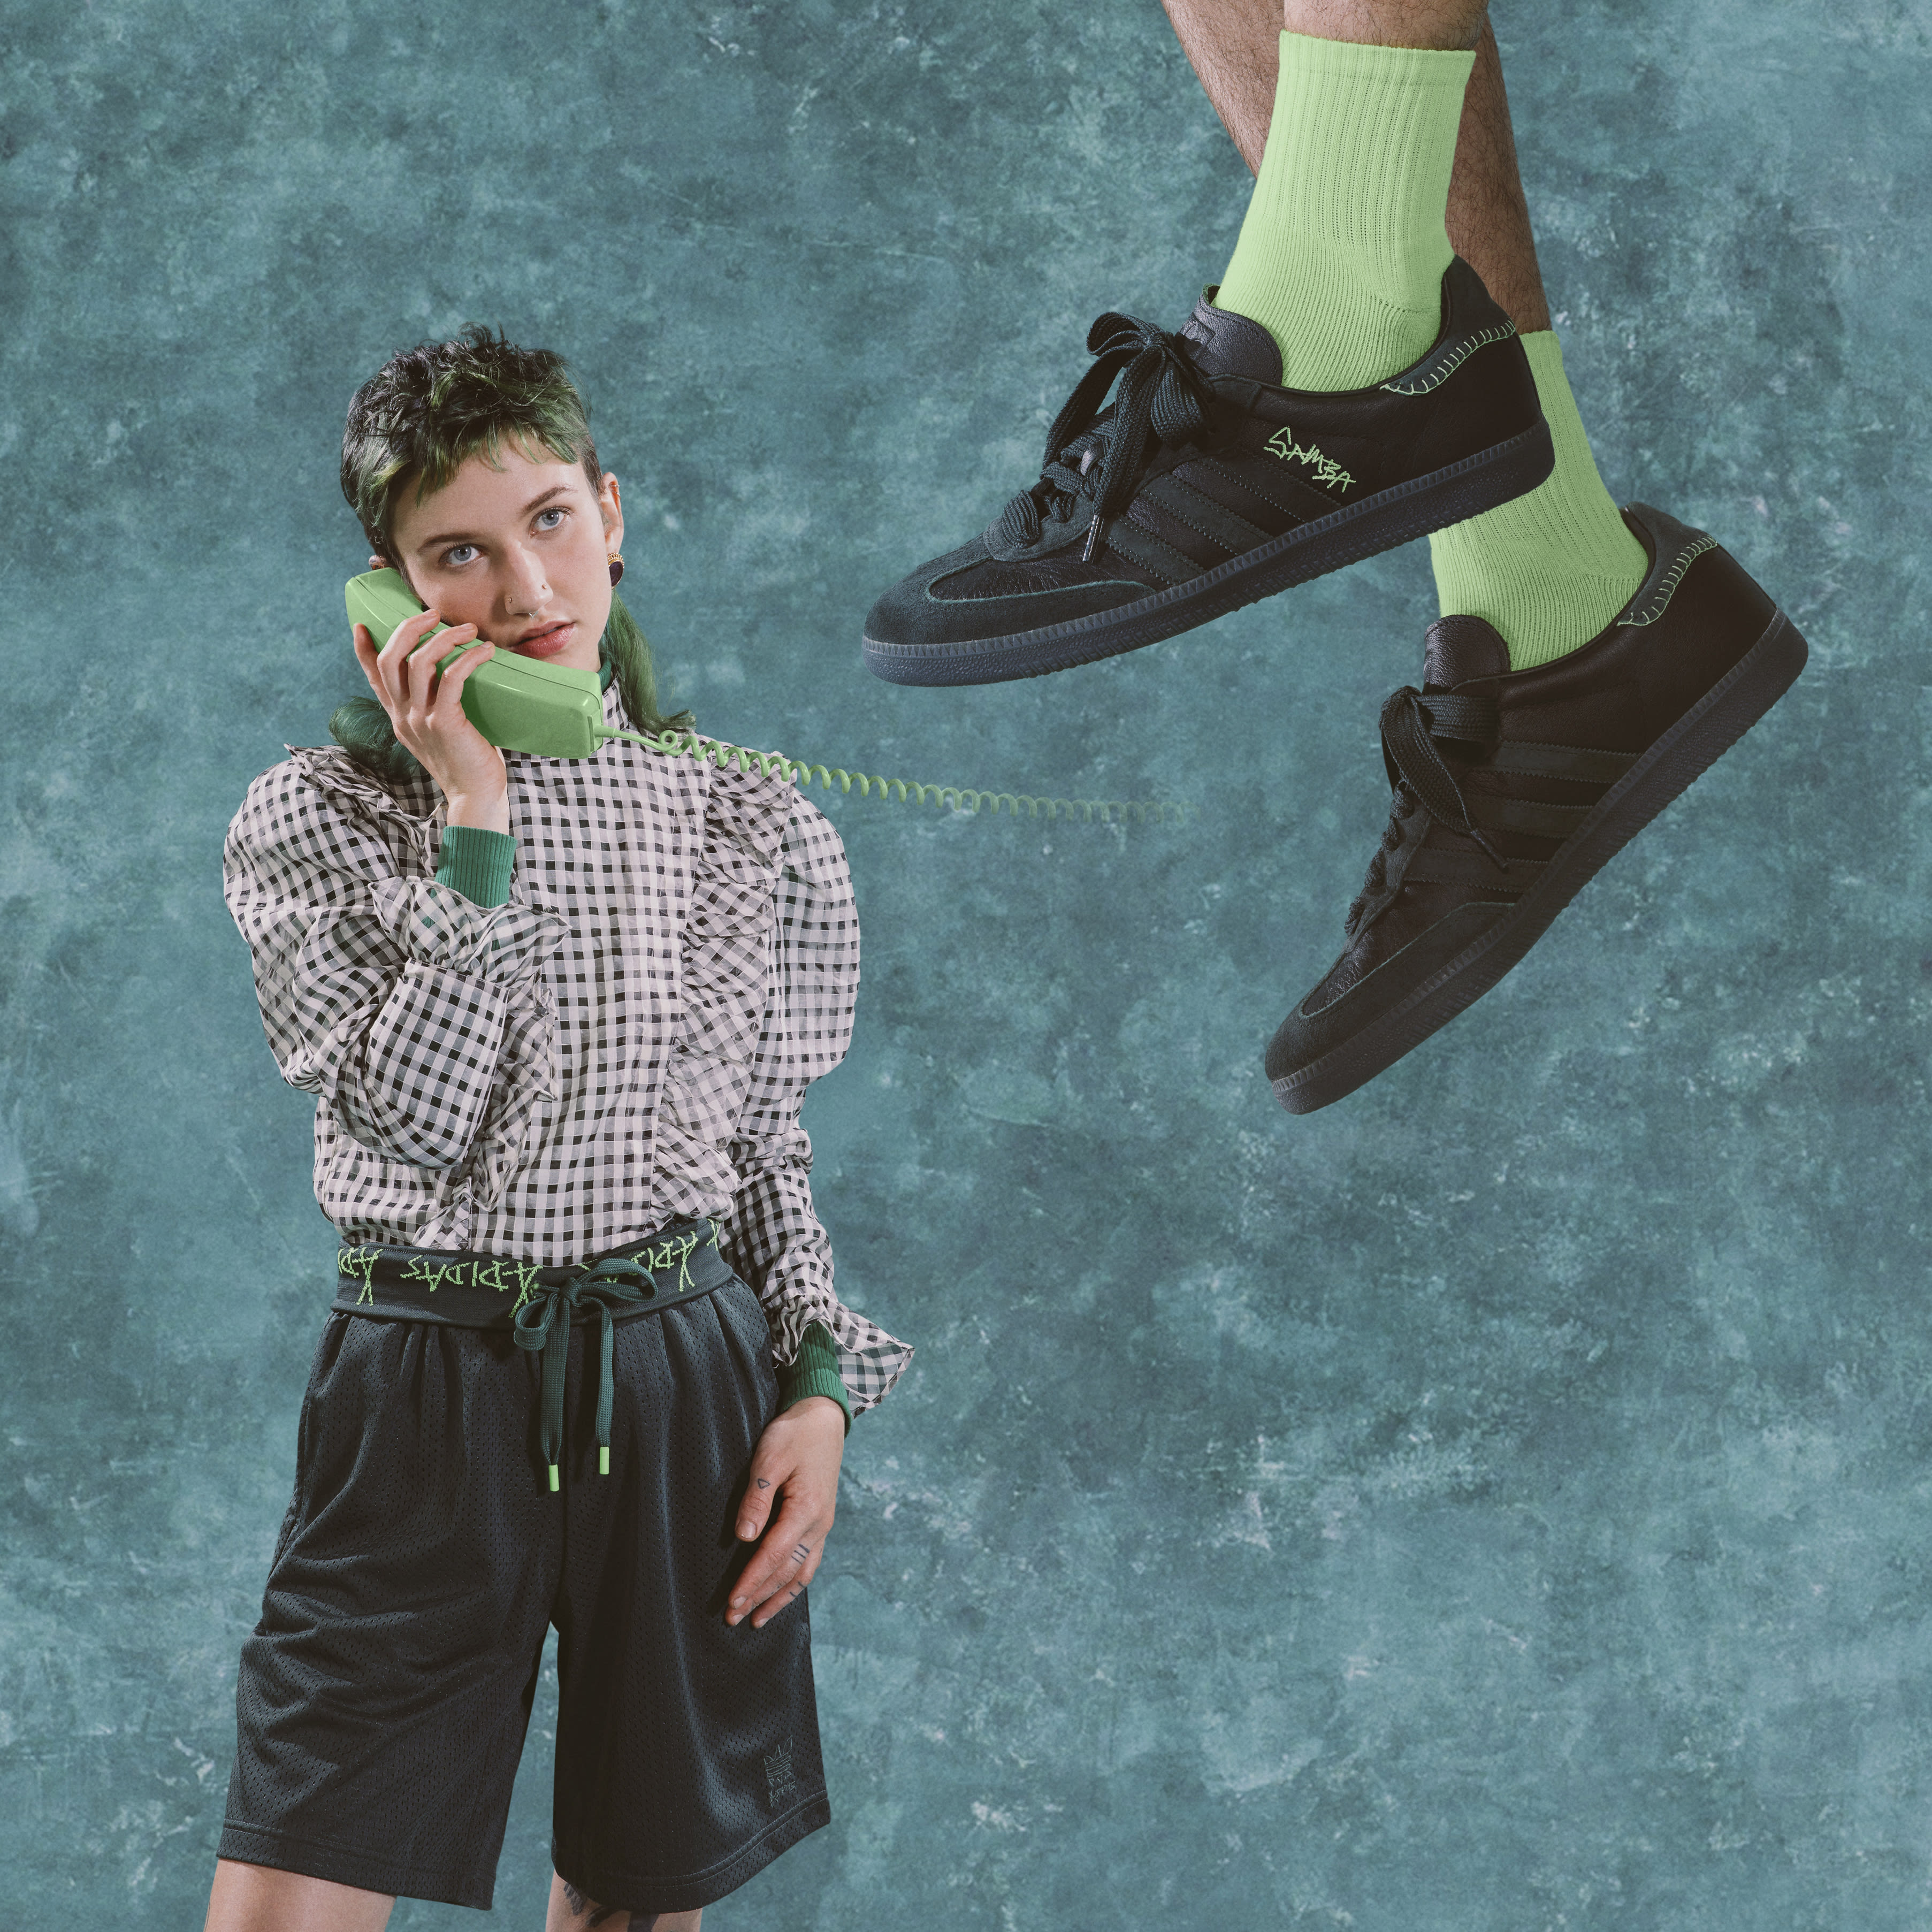 Jonah Hill x Adidas Samba Mineral Green